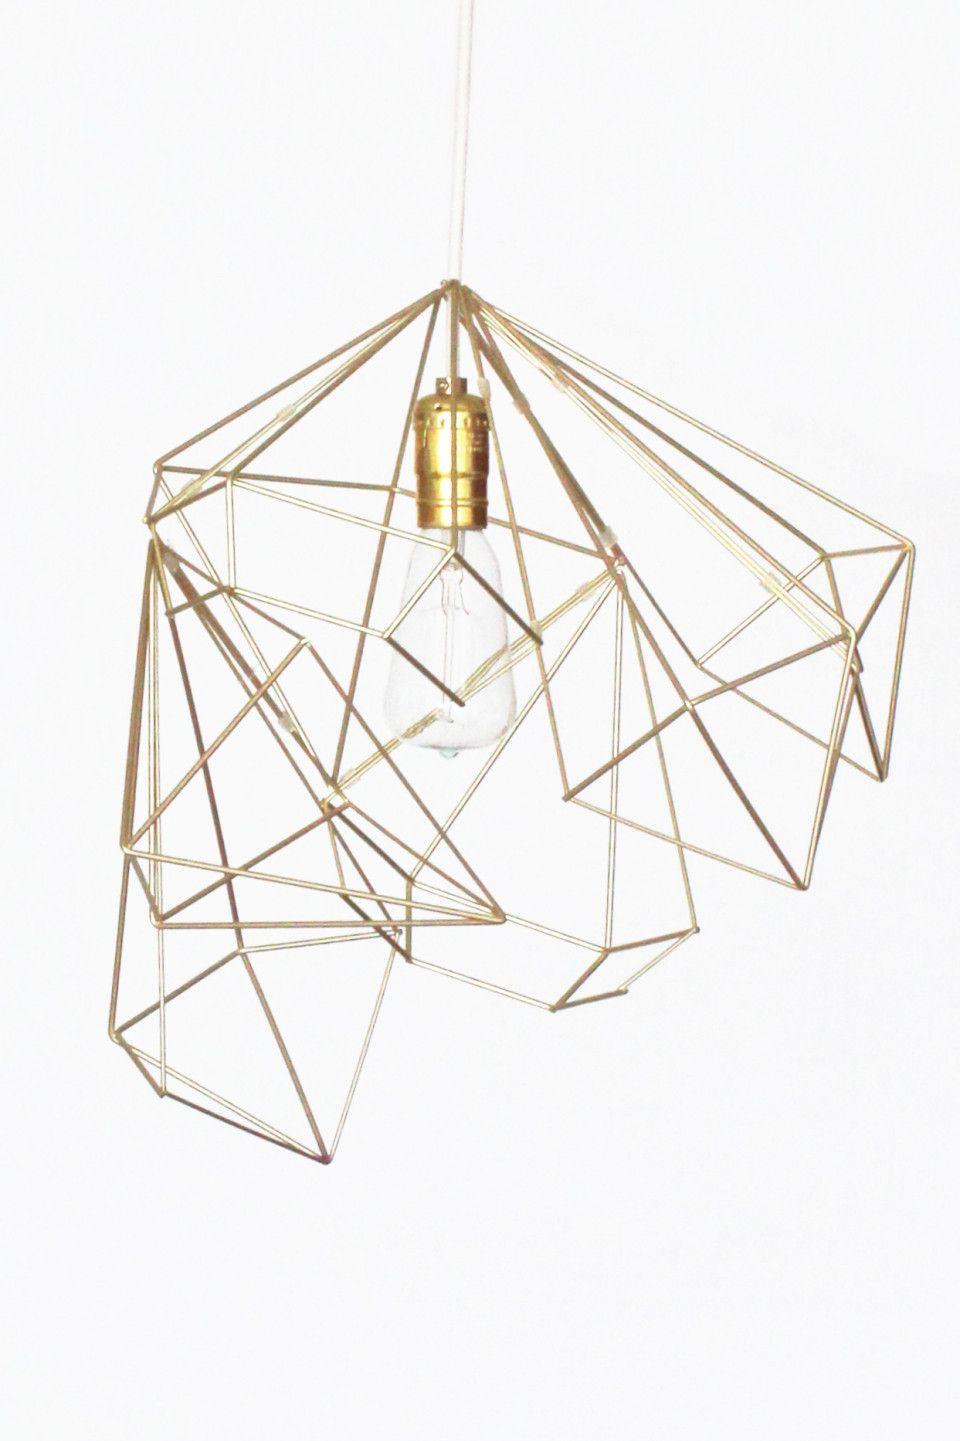 Diy Gold pendant light | DIY Geometric Pendant Light | Pinterest ... for Diy Geometric Lamp  268zmd